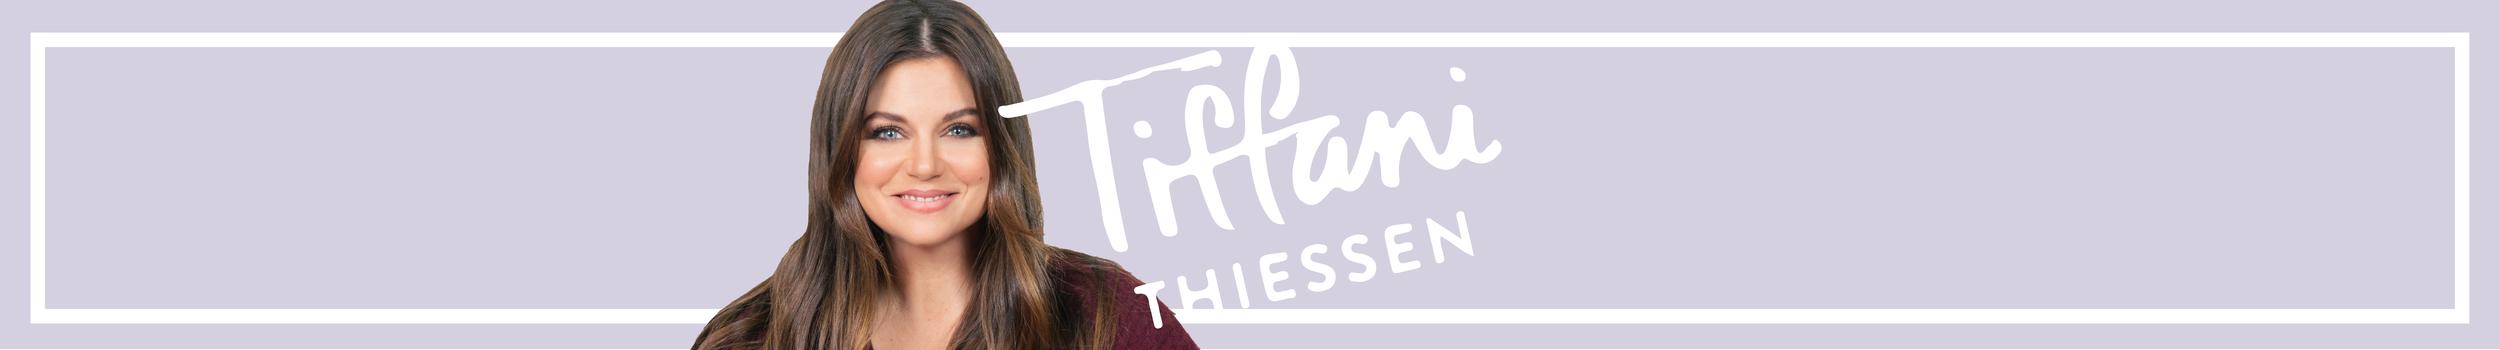 tiffani_thiessen_banner.png